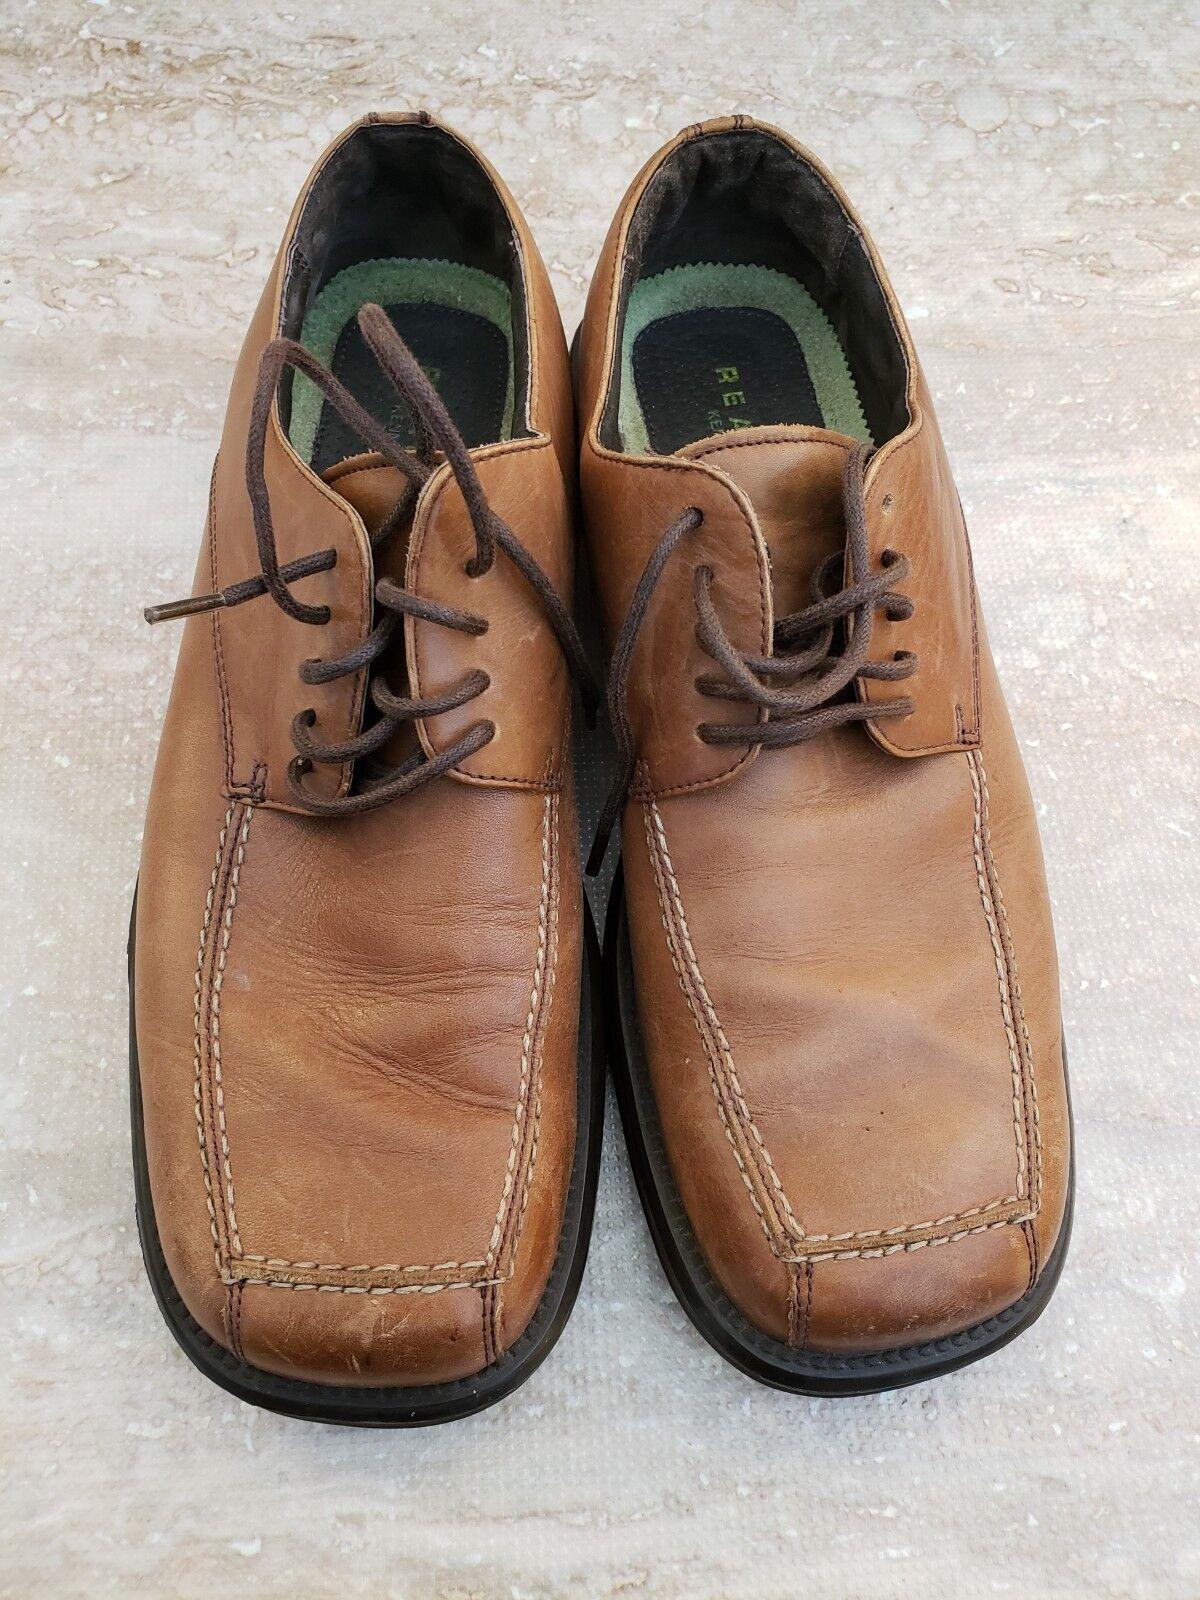 Kenneth Cole Reaction Dress Shoes Lace Up Men's Brown Size 8.5 MSquare Toe